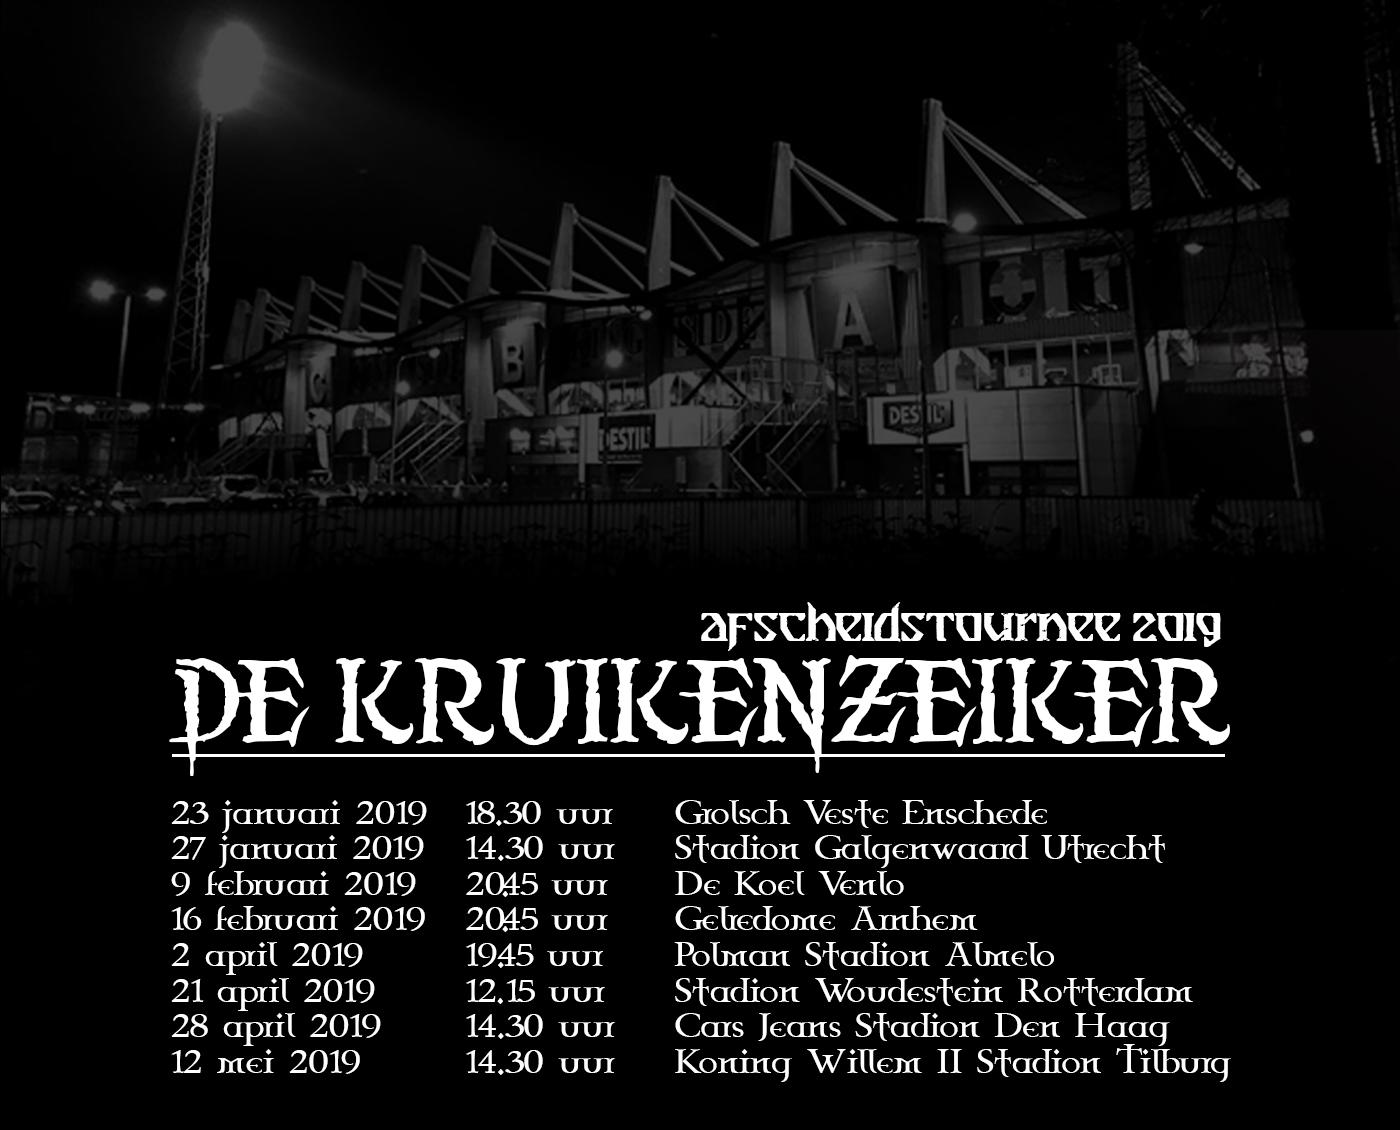 De Kruikenzeiker Afscheidstournee 2019!